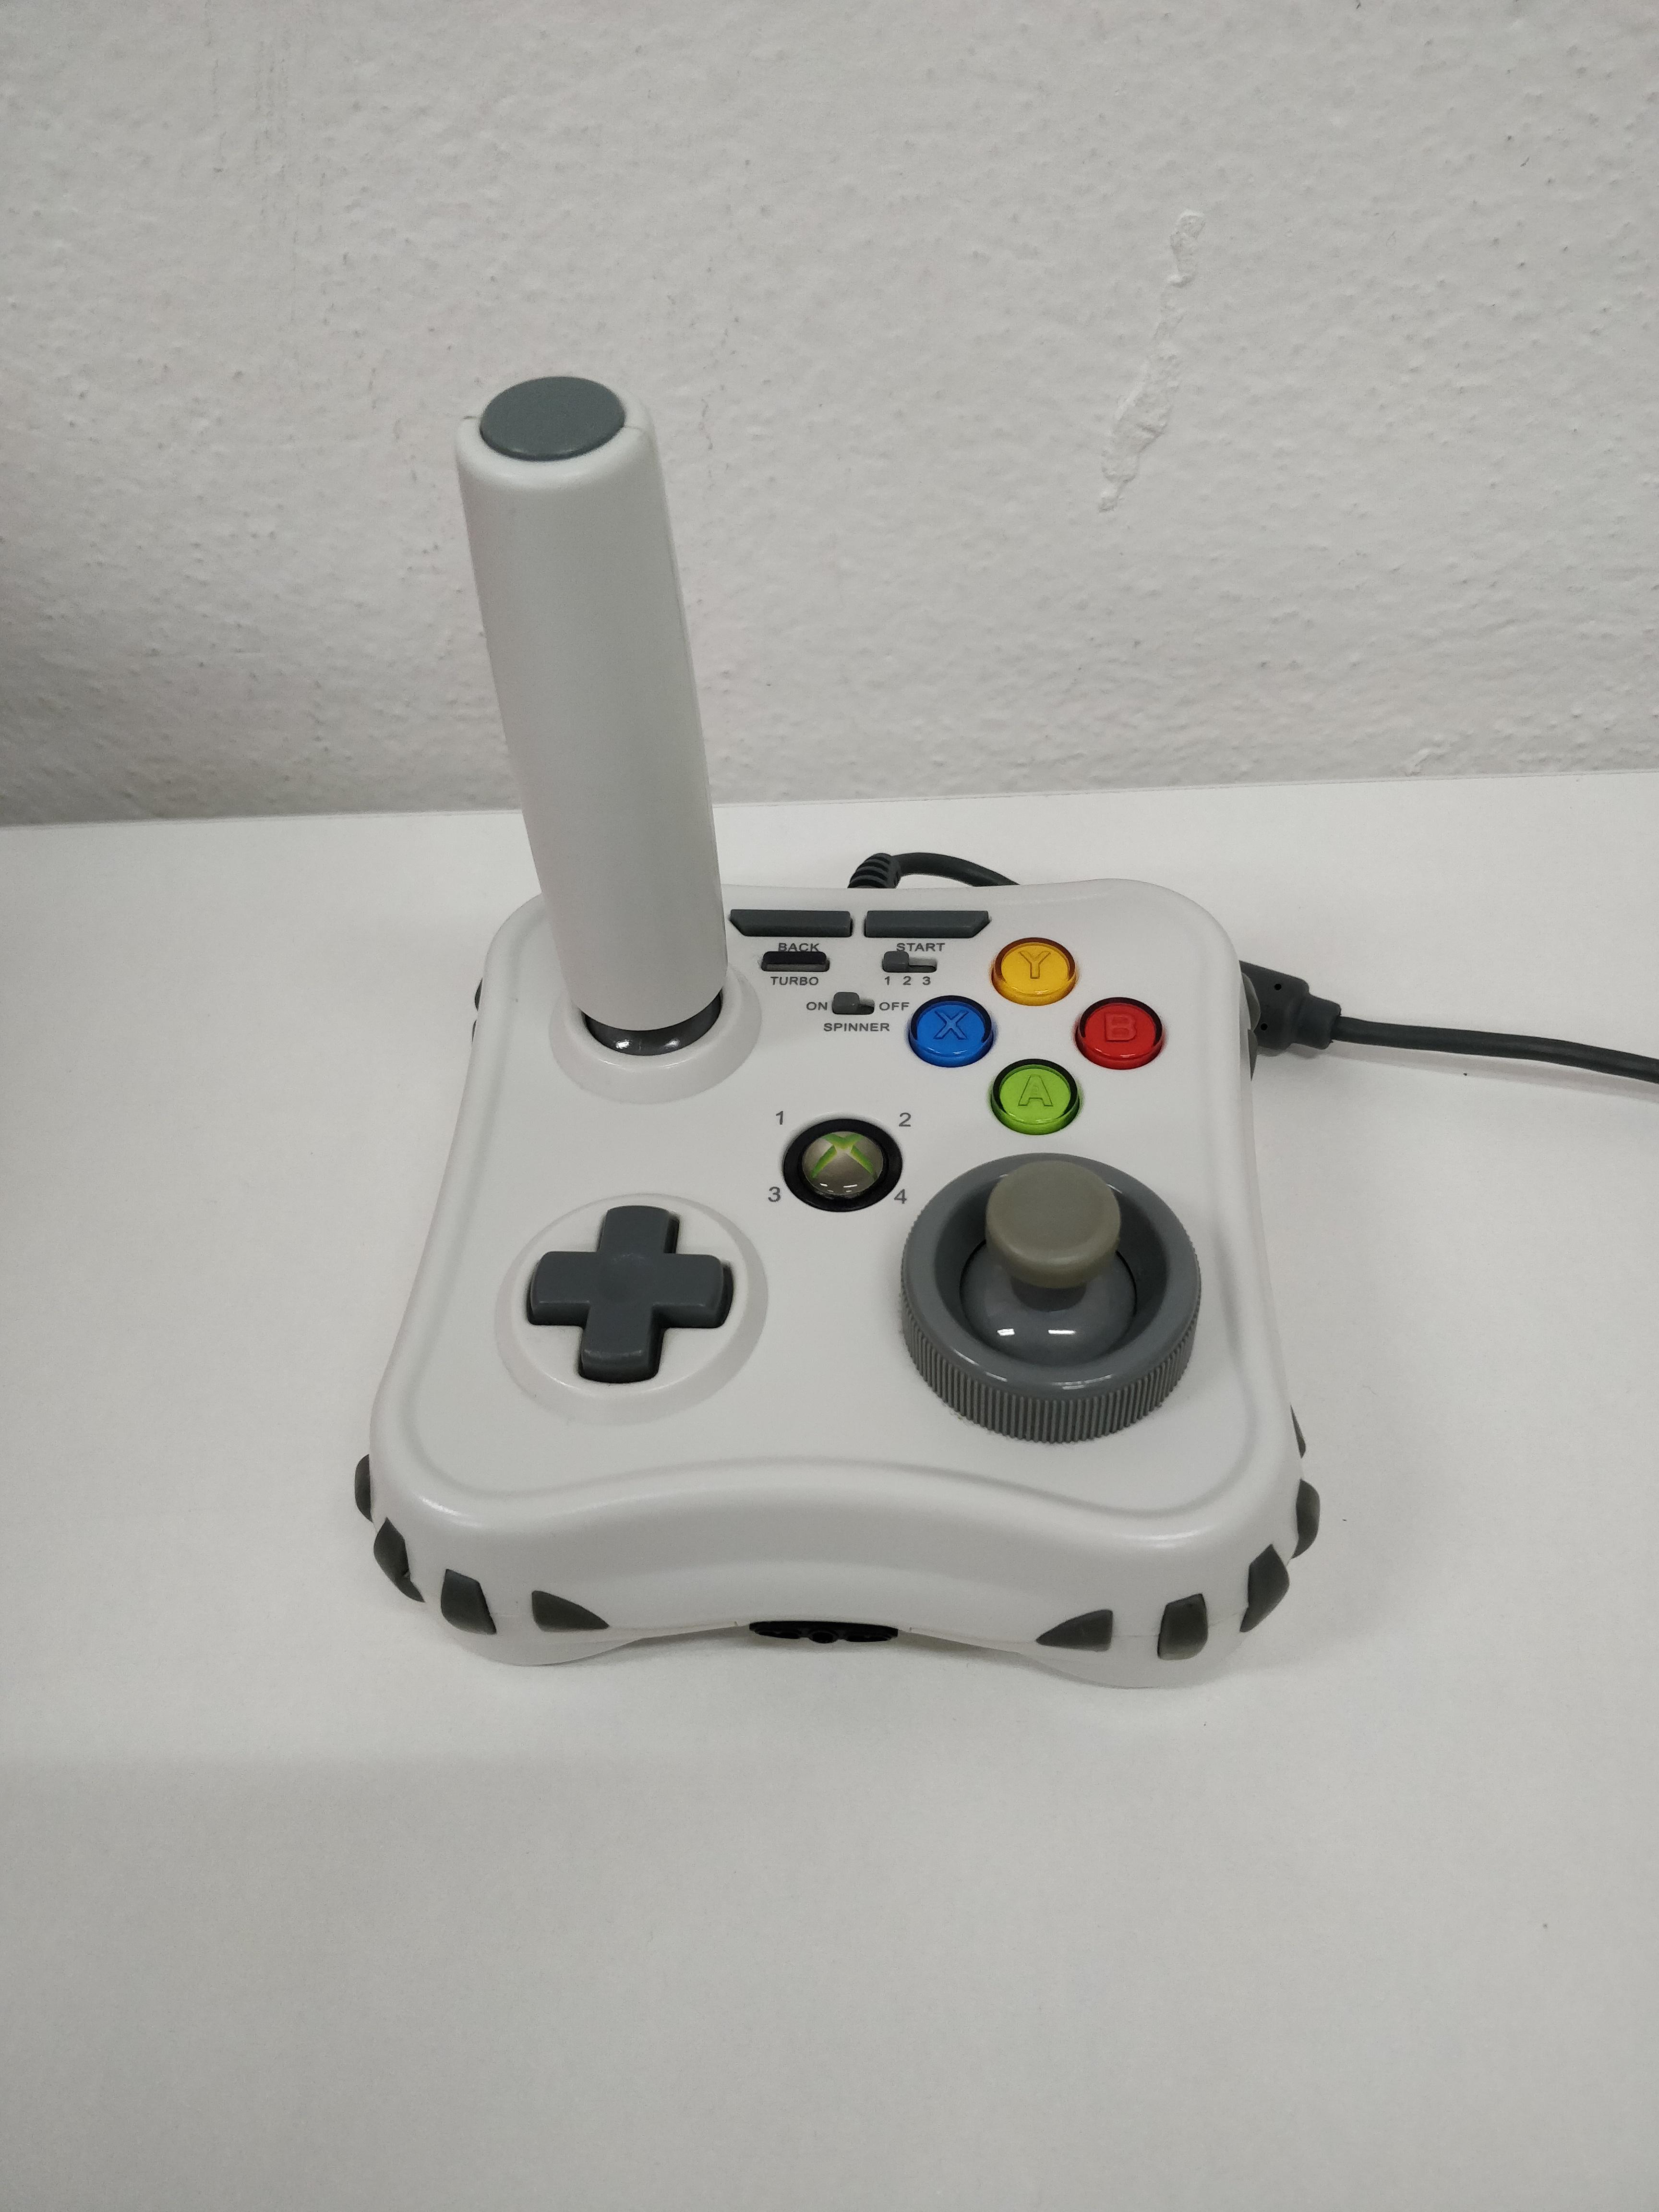 [Xbox 360] MadCatz Arcade Game Stick + USB redukce (estetická vada)